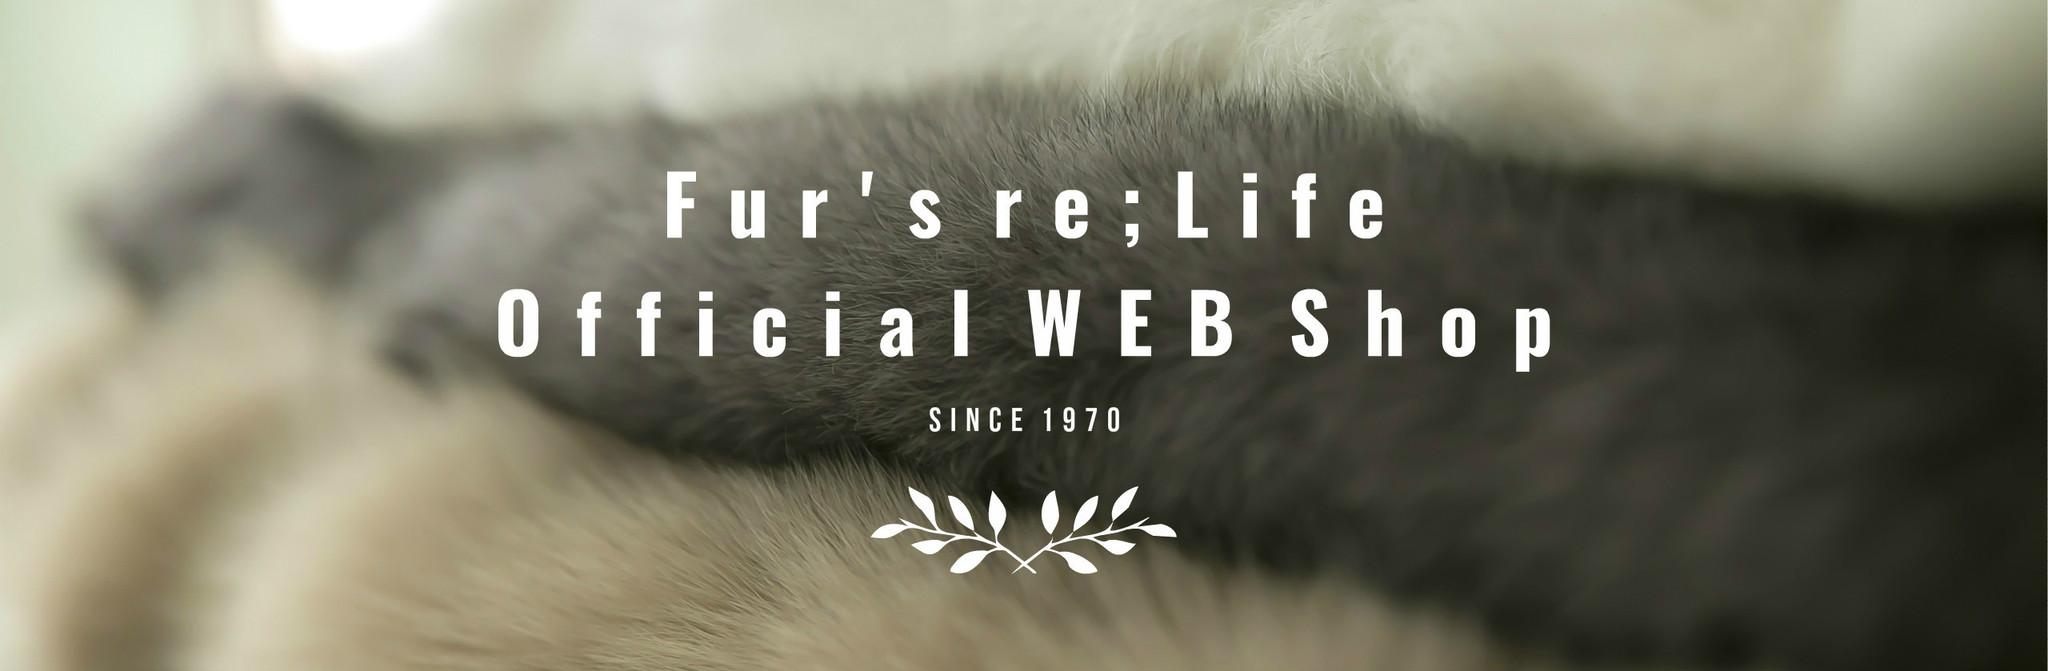 Fur's re;Life